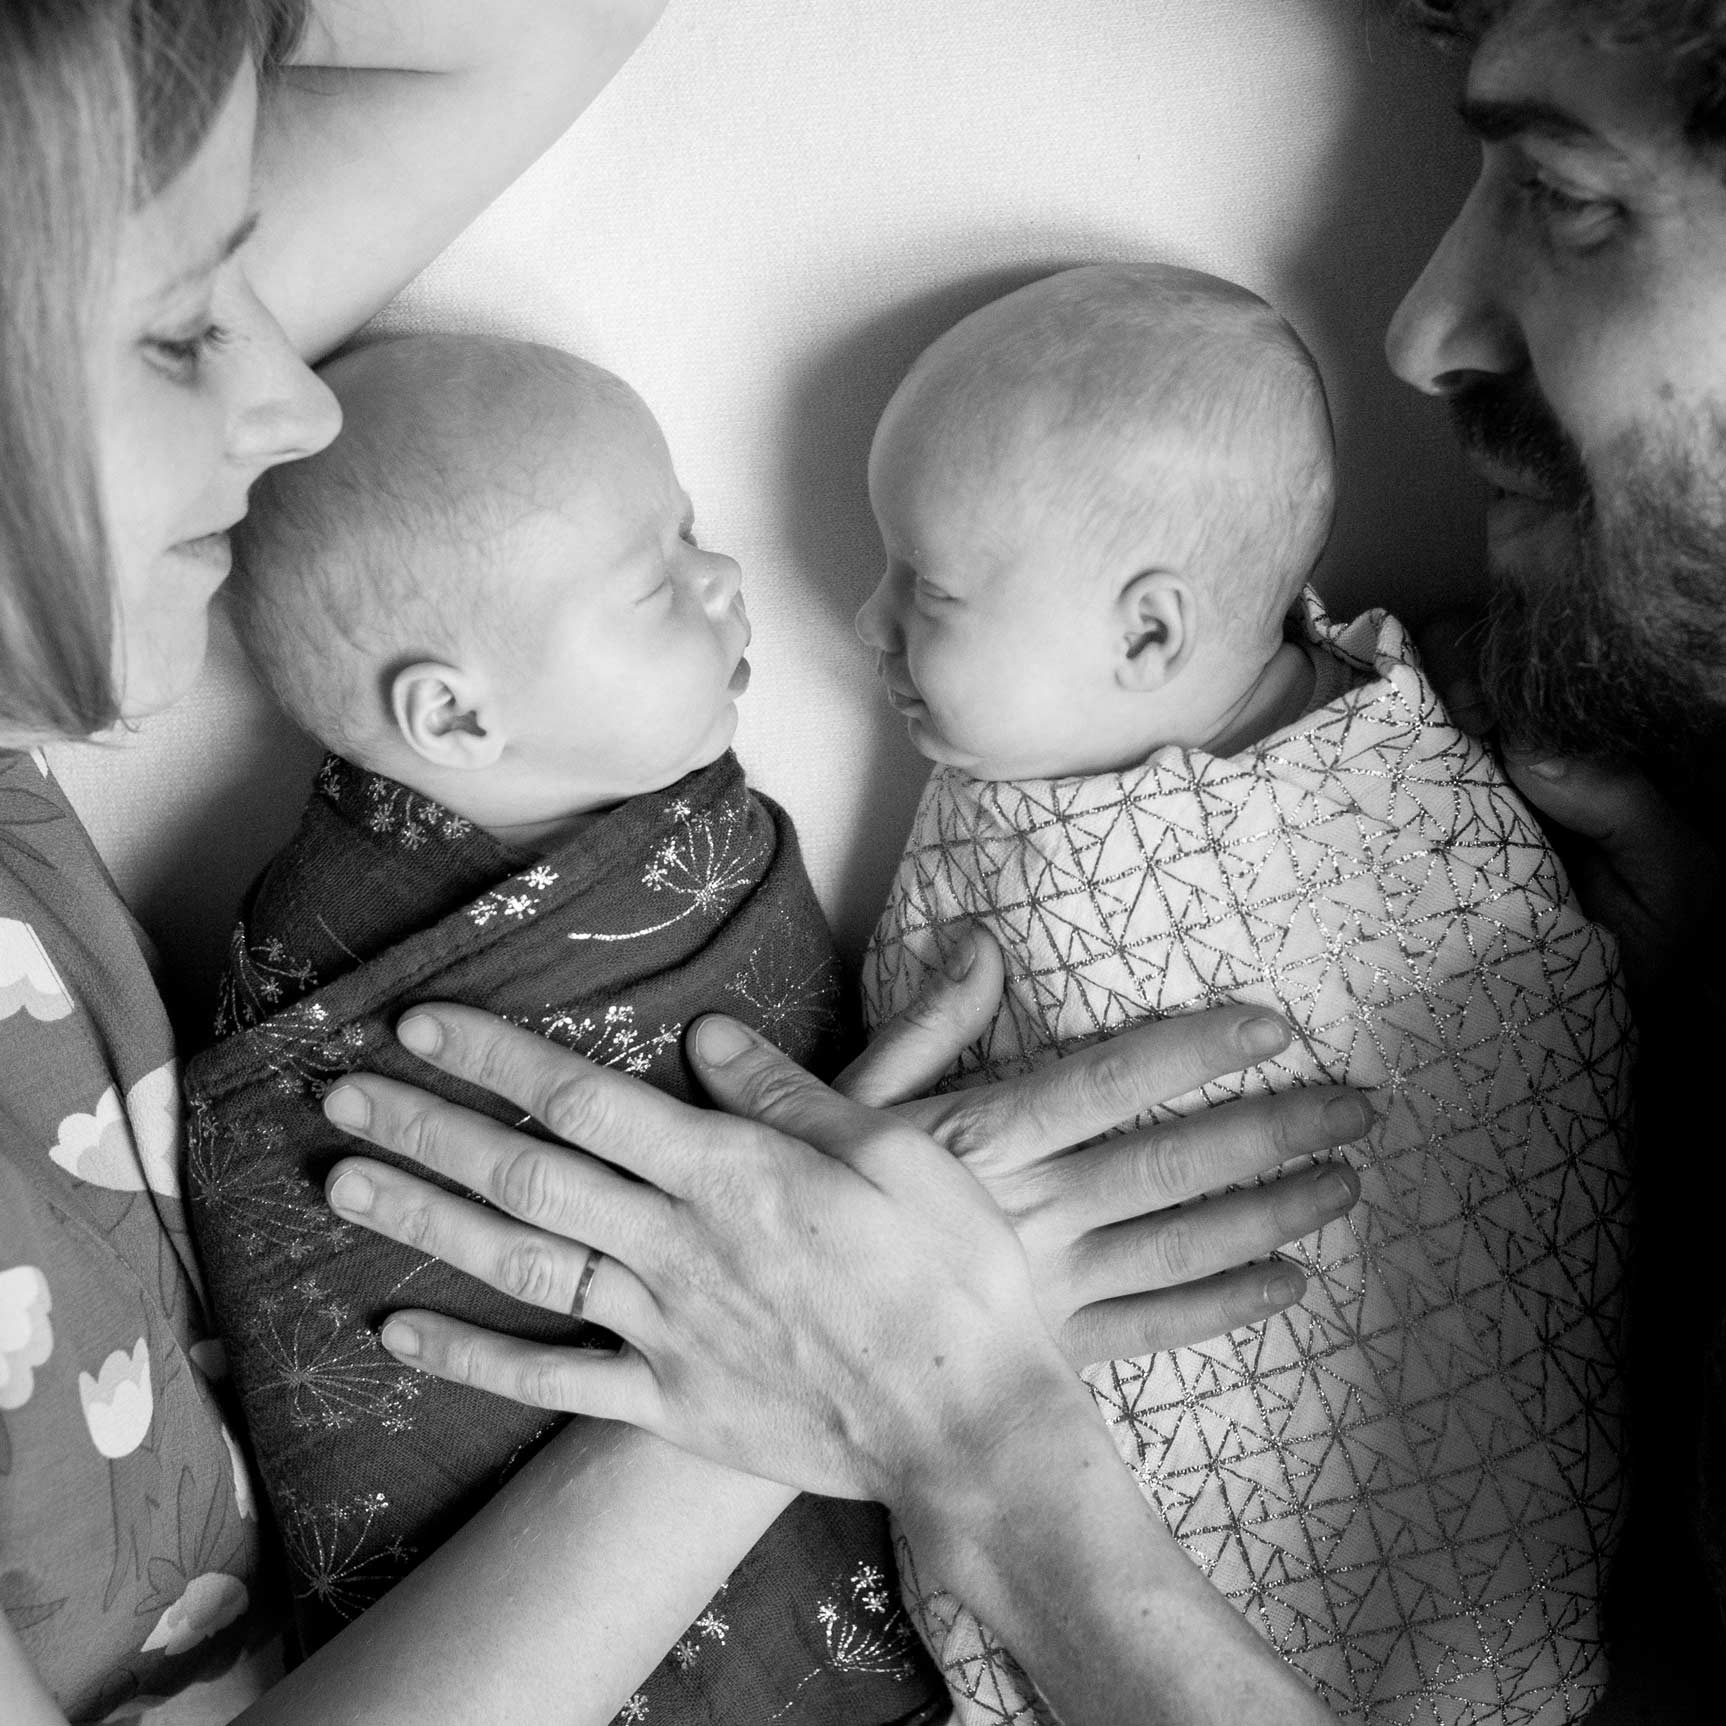 Ines-Aramburo-newborn-paris-lifestyle-photo-session-nouveau-ne-seance-photographe-52.jpg